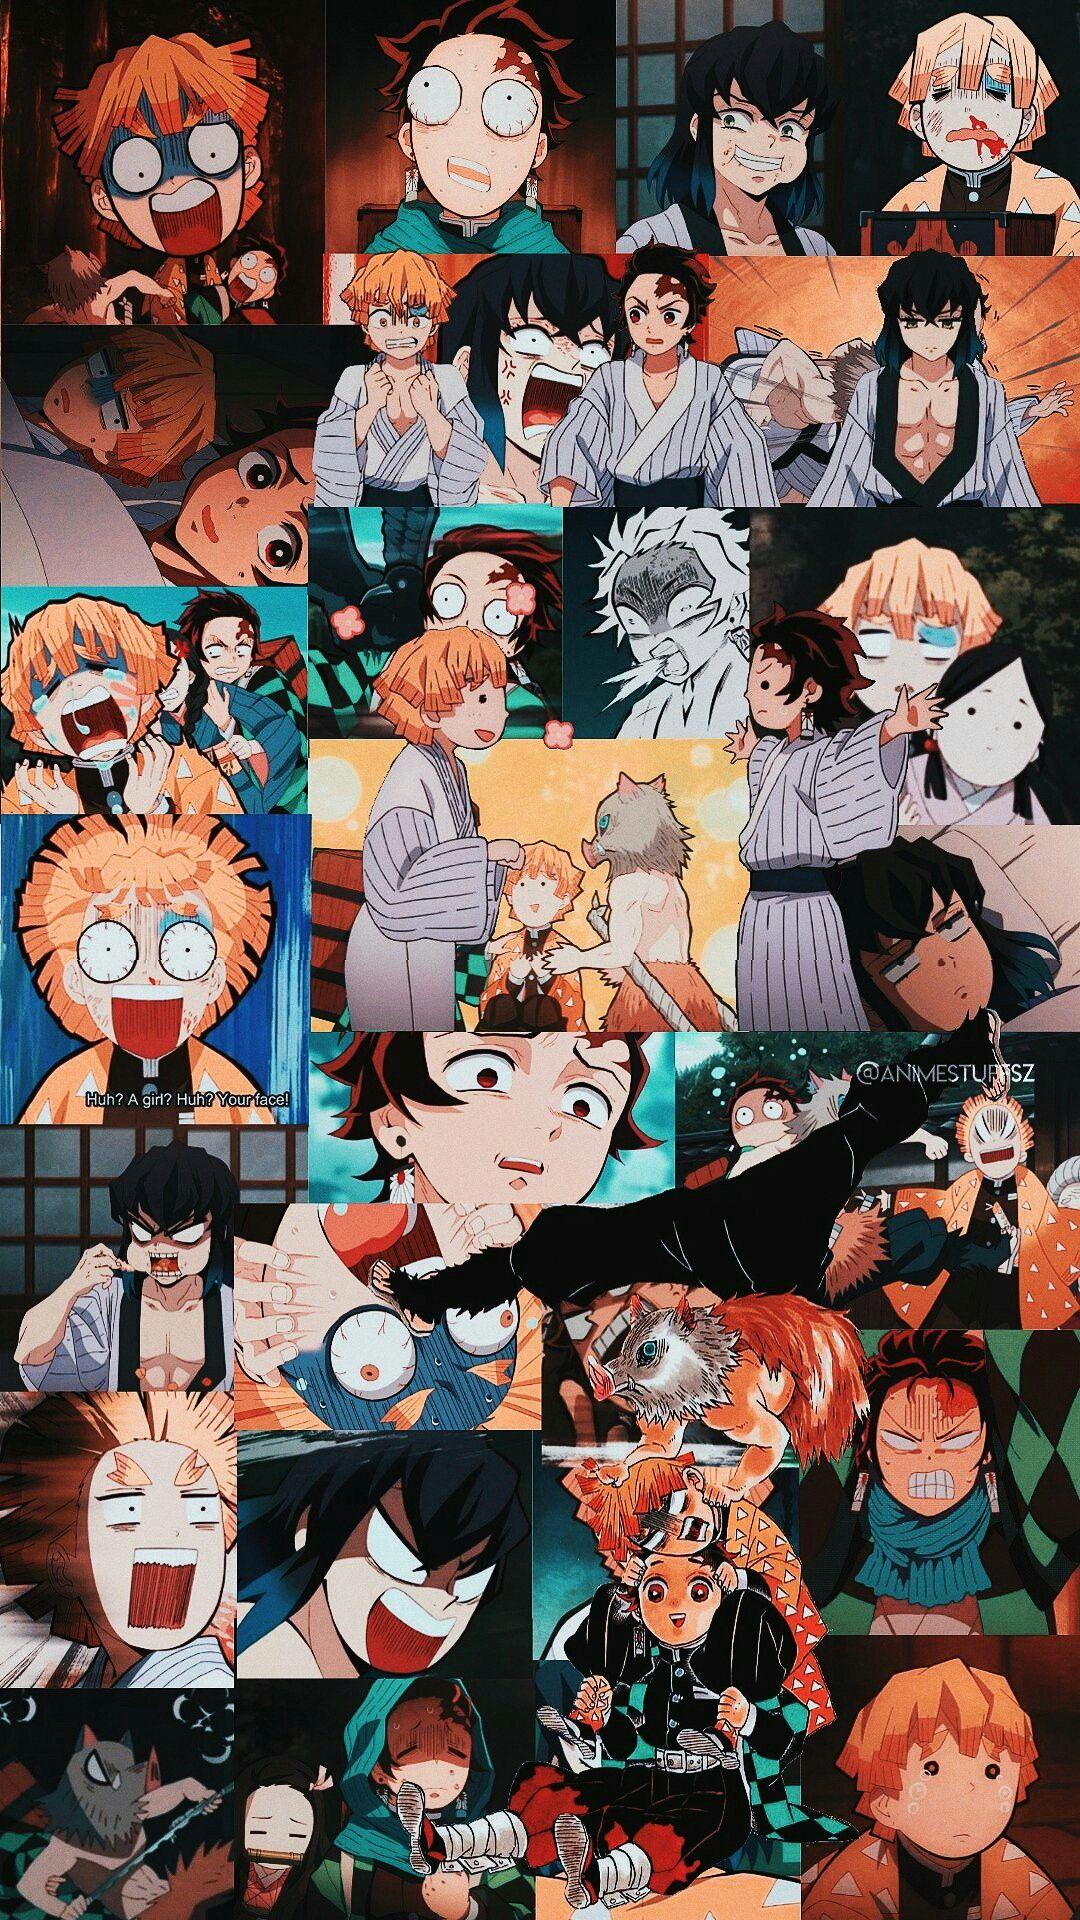 Cute Anime Wallpaper Image By Manar On انمي Anime Wallpaper